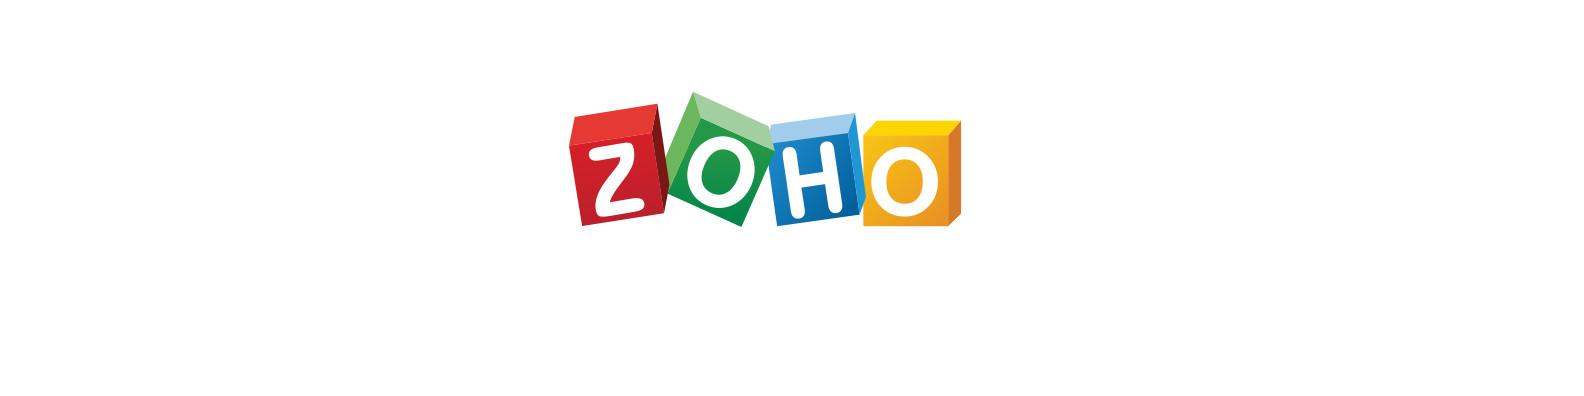 Zoho Corporation.